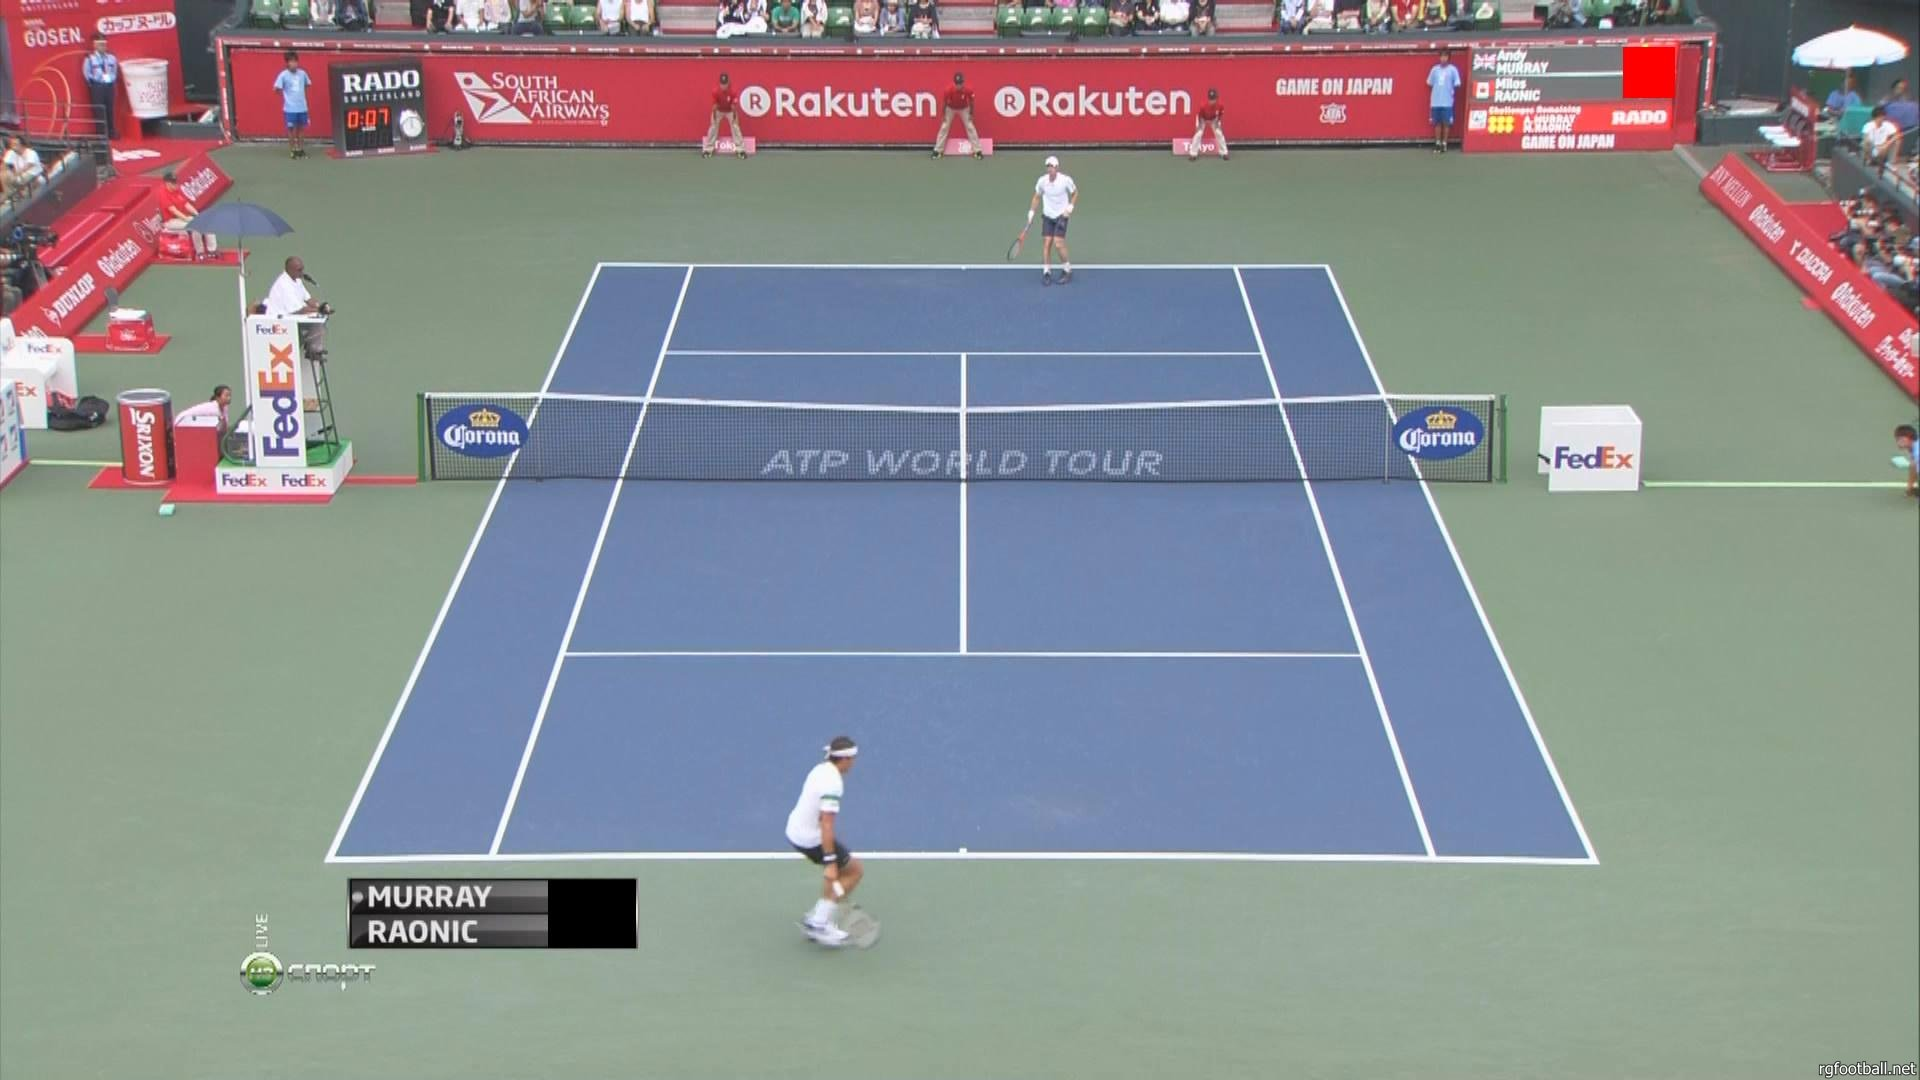 Modding Courts Players Tour